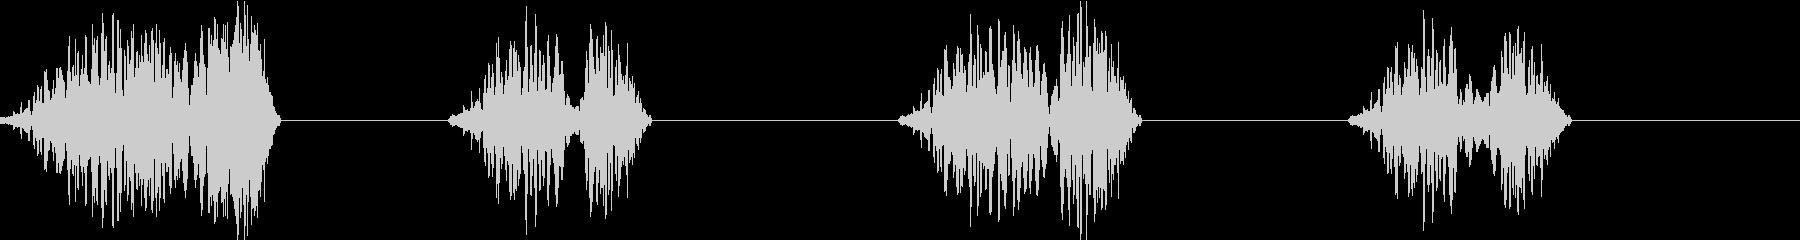 DJプレイ スクラッチ・ノイズ 173の未再生の波形